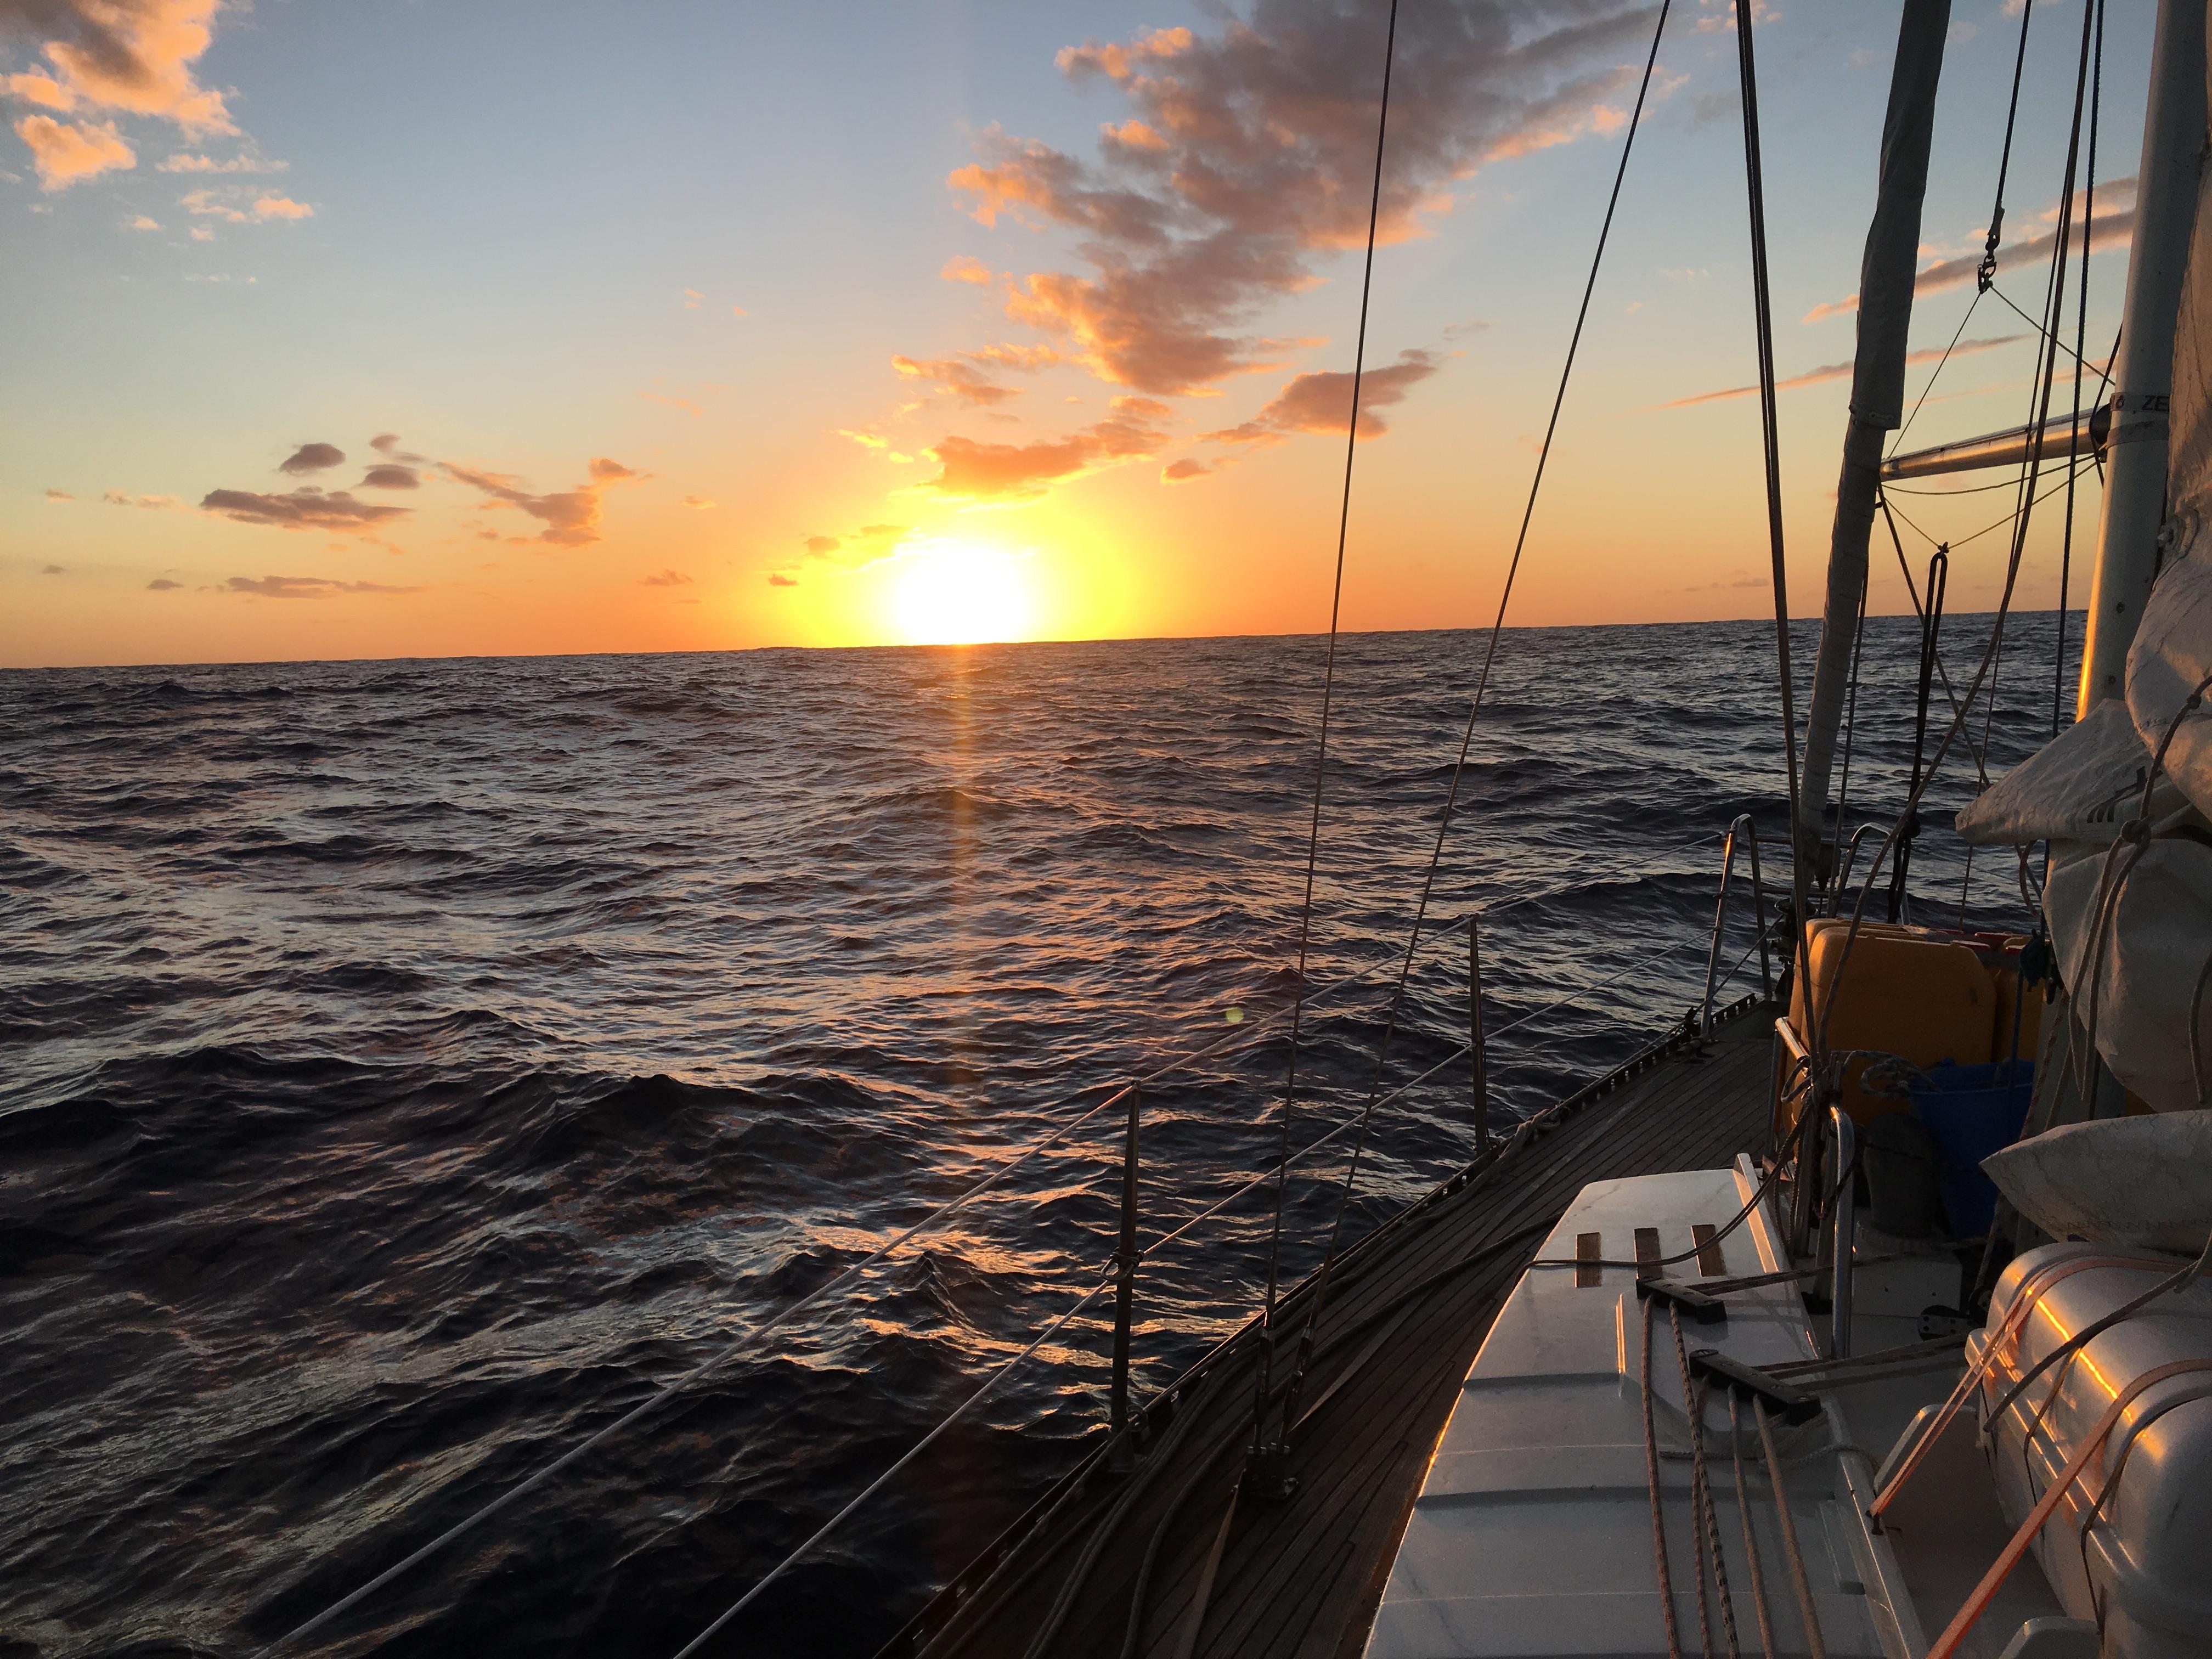 A sunrise in the Atlantic ocean.